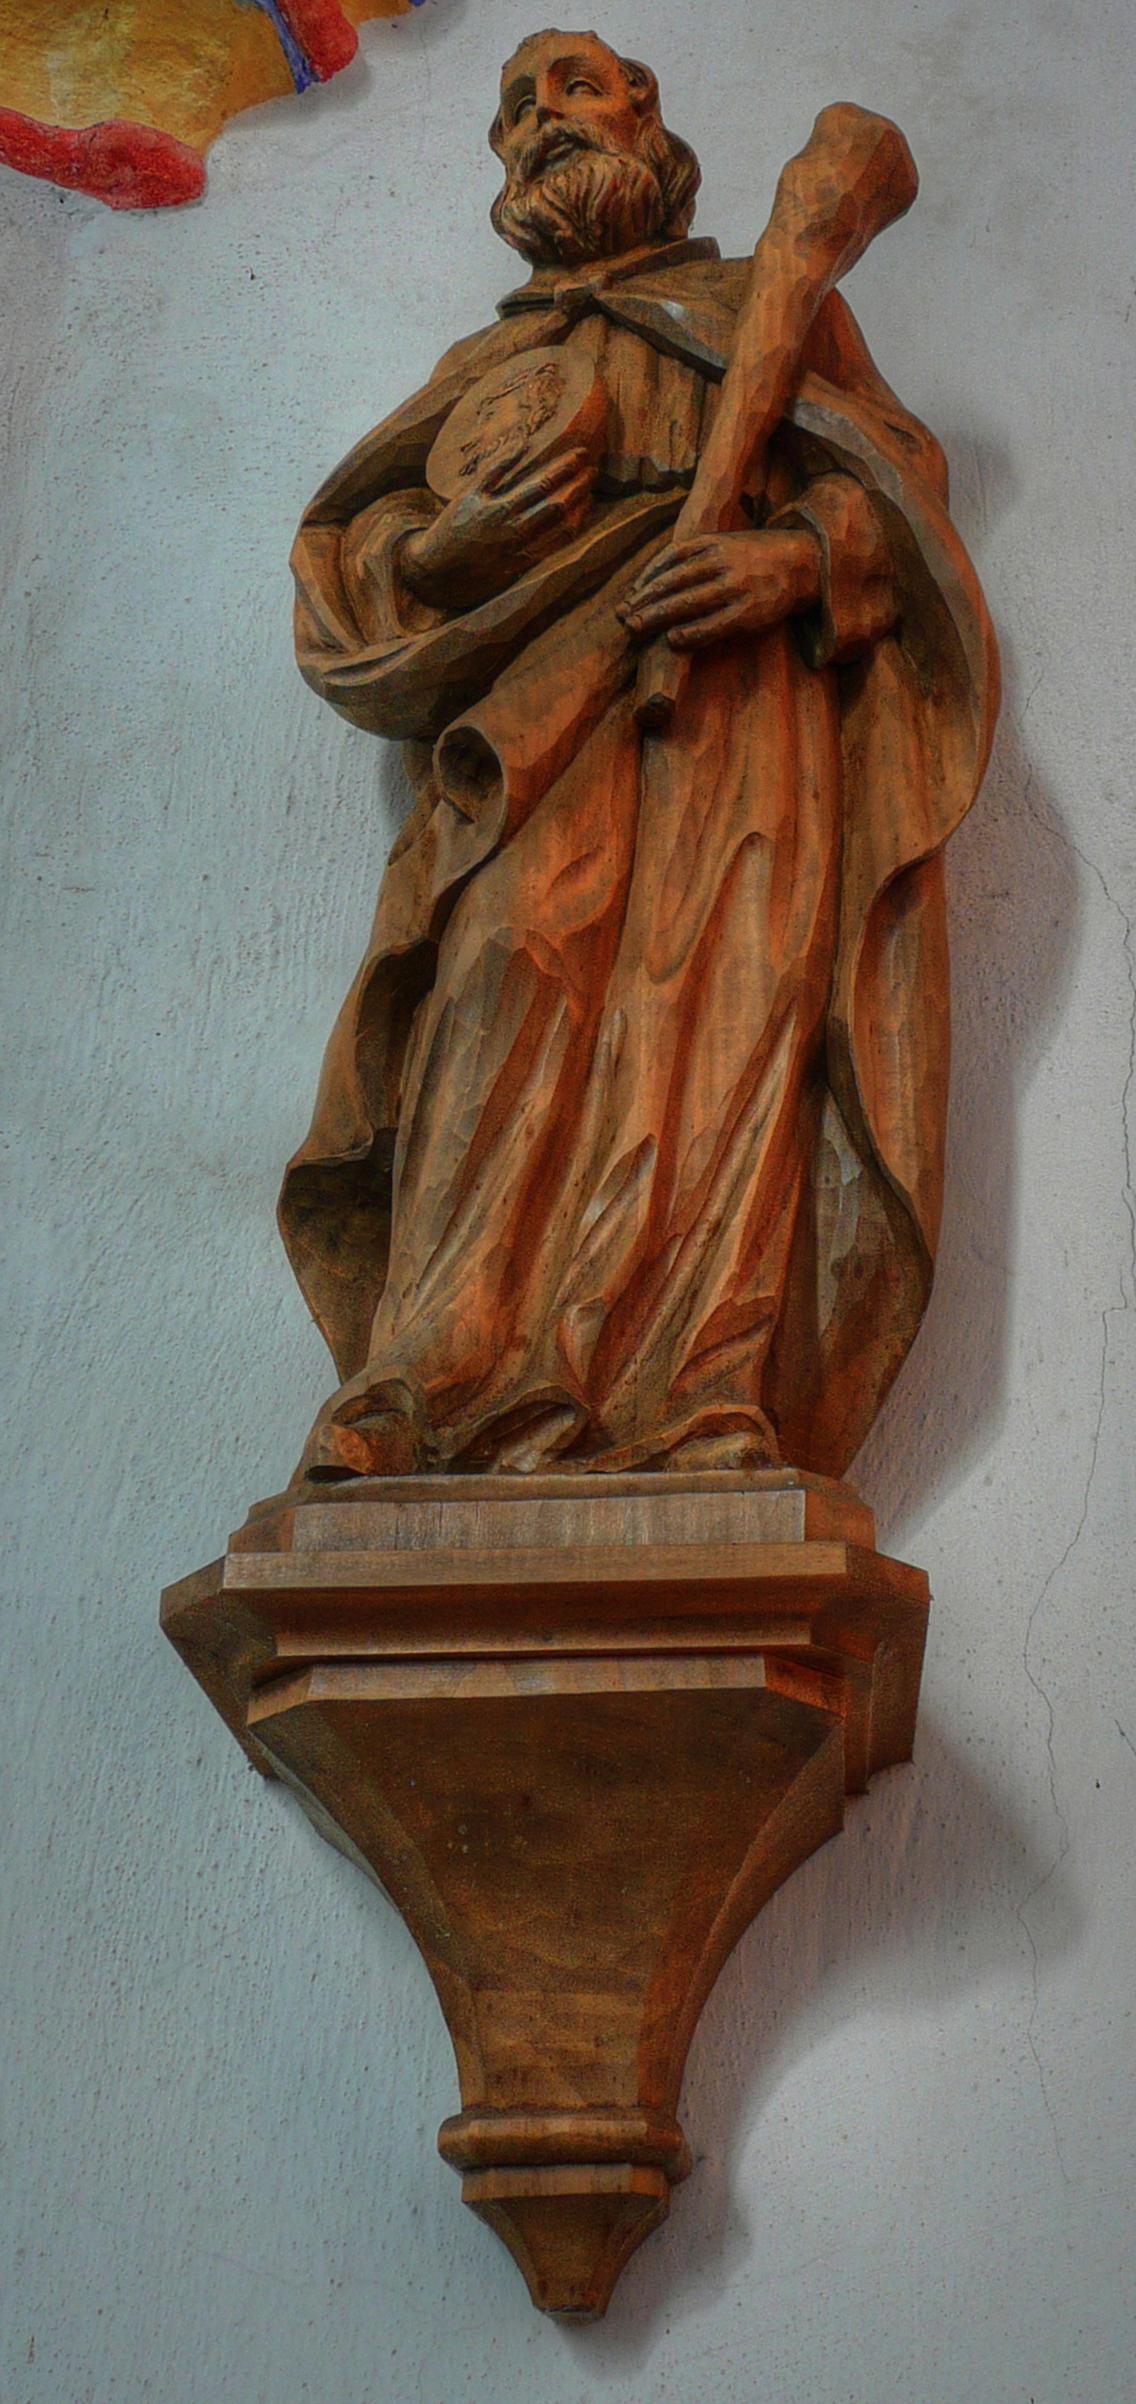 http://upload.wikimedia.org/wikipedia/commons/4/49/Distelrath_Ühledömche_Judas_Thaddäus_HDR.jpg